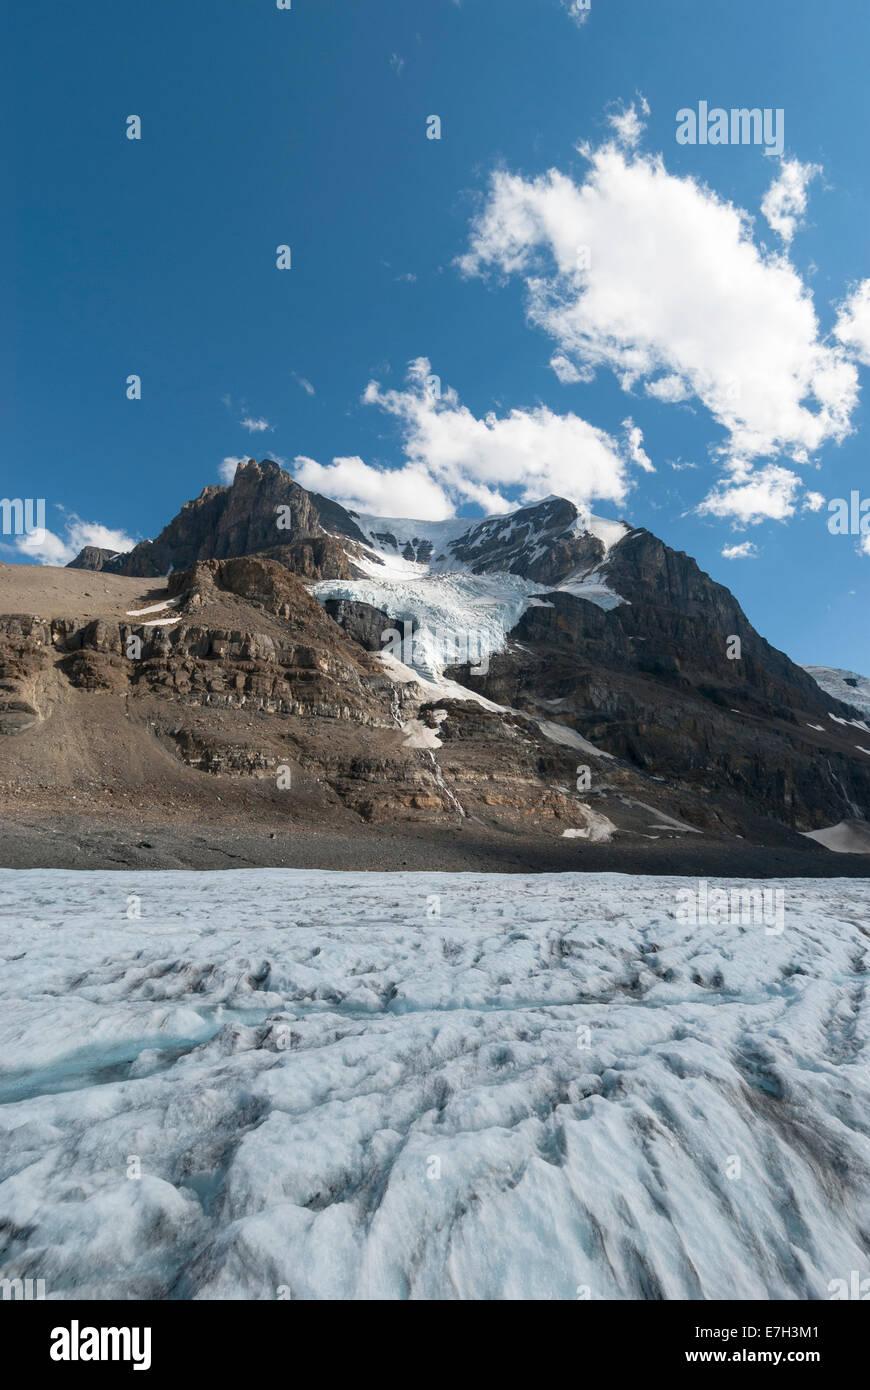 Elk203-7446v Canada, Alberta, Jasper National Park, Columbia Icefield, Athabasca Glacier - Stock Image